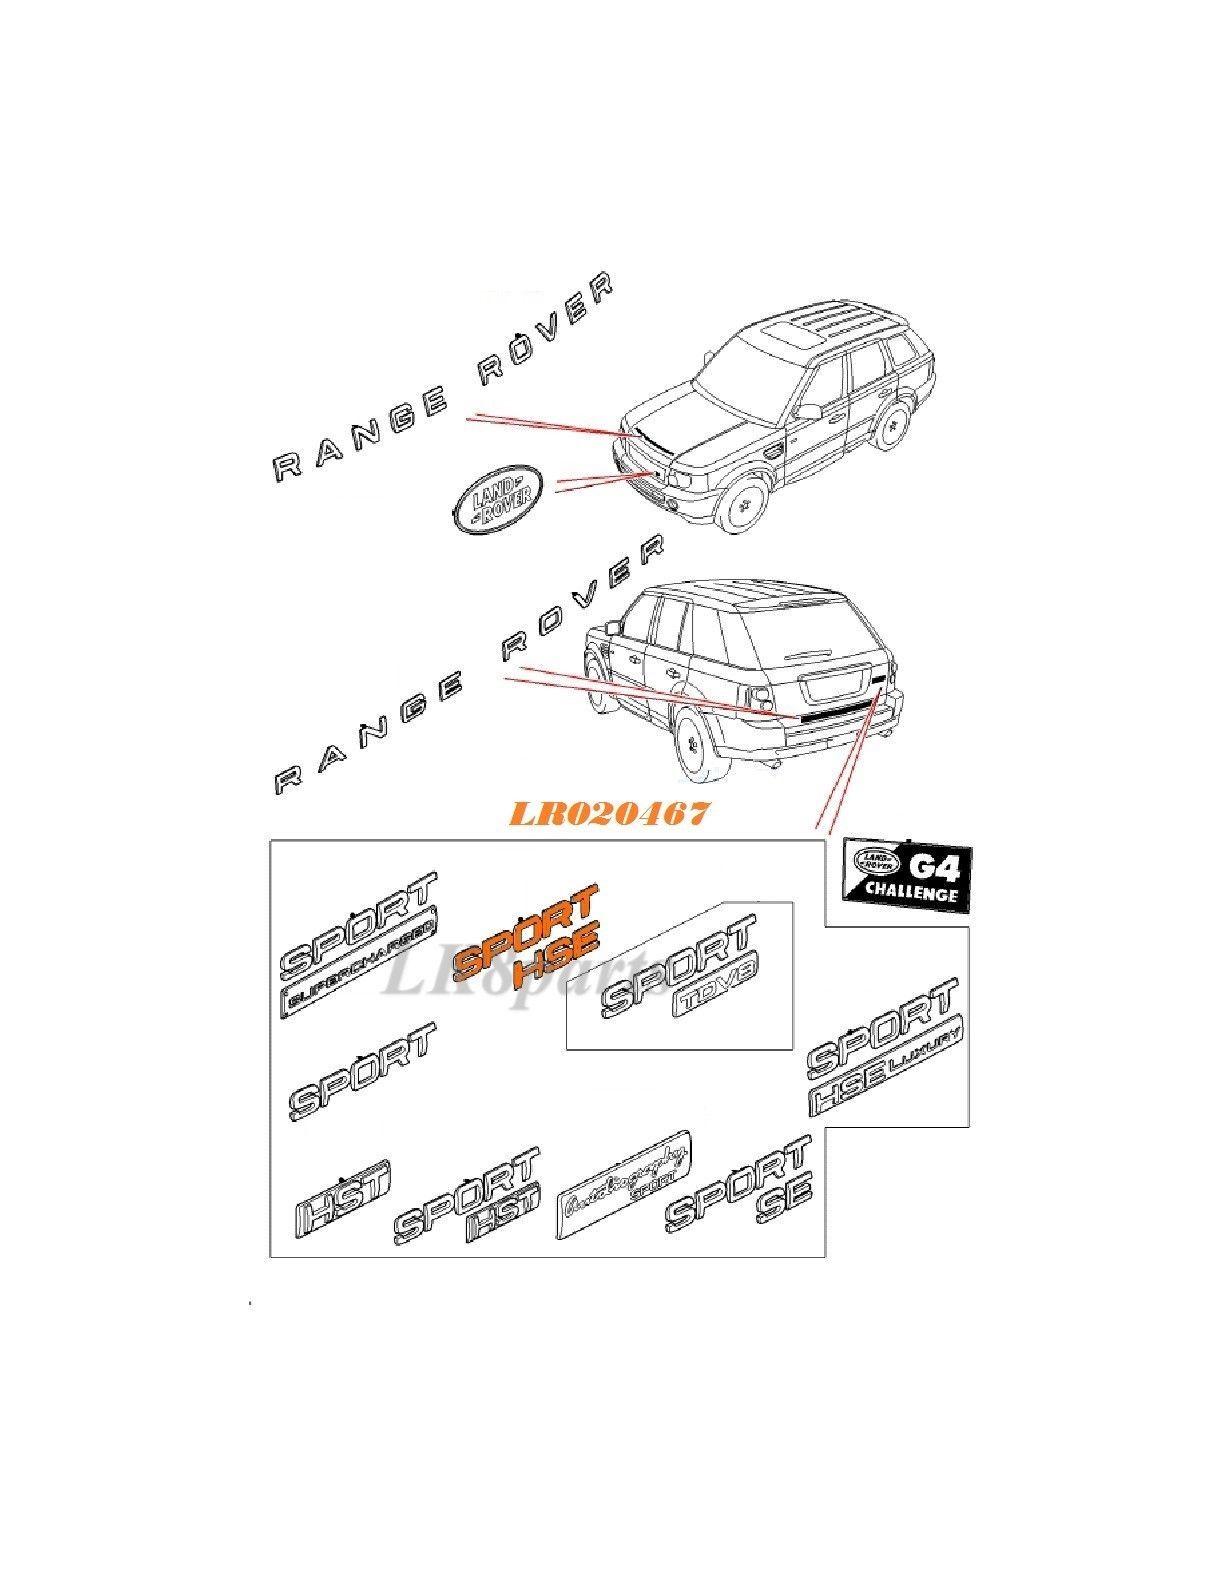 Land rover range sport hse emblem decal plate badge lr020467 new